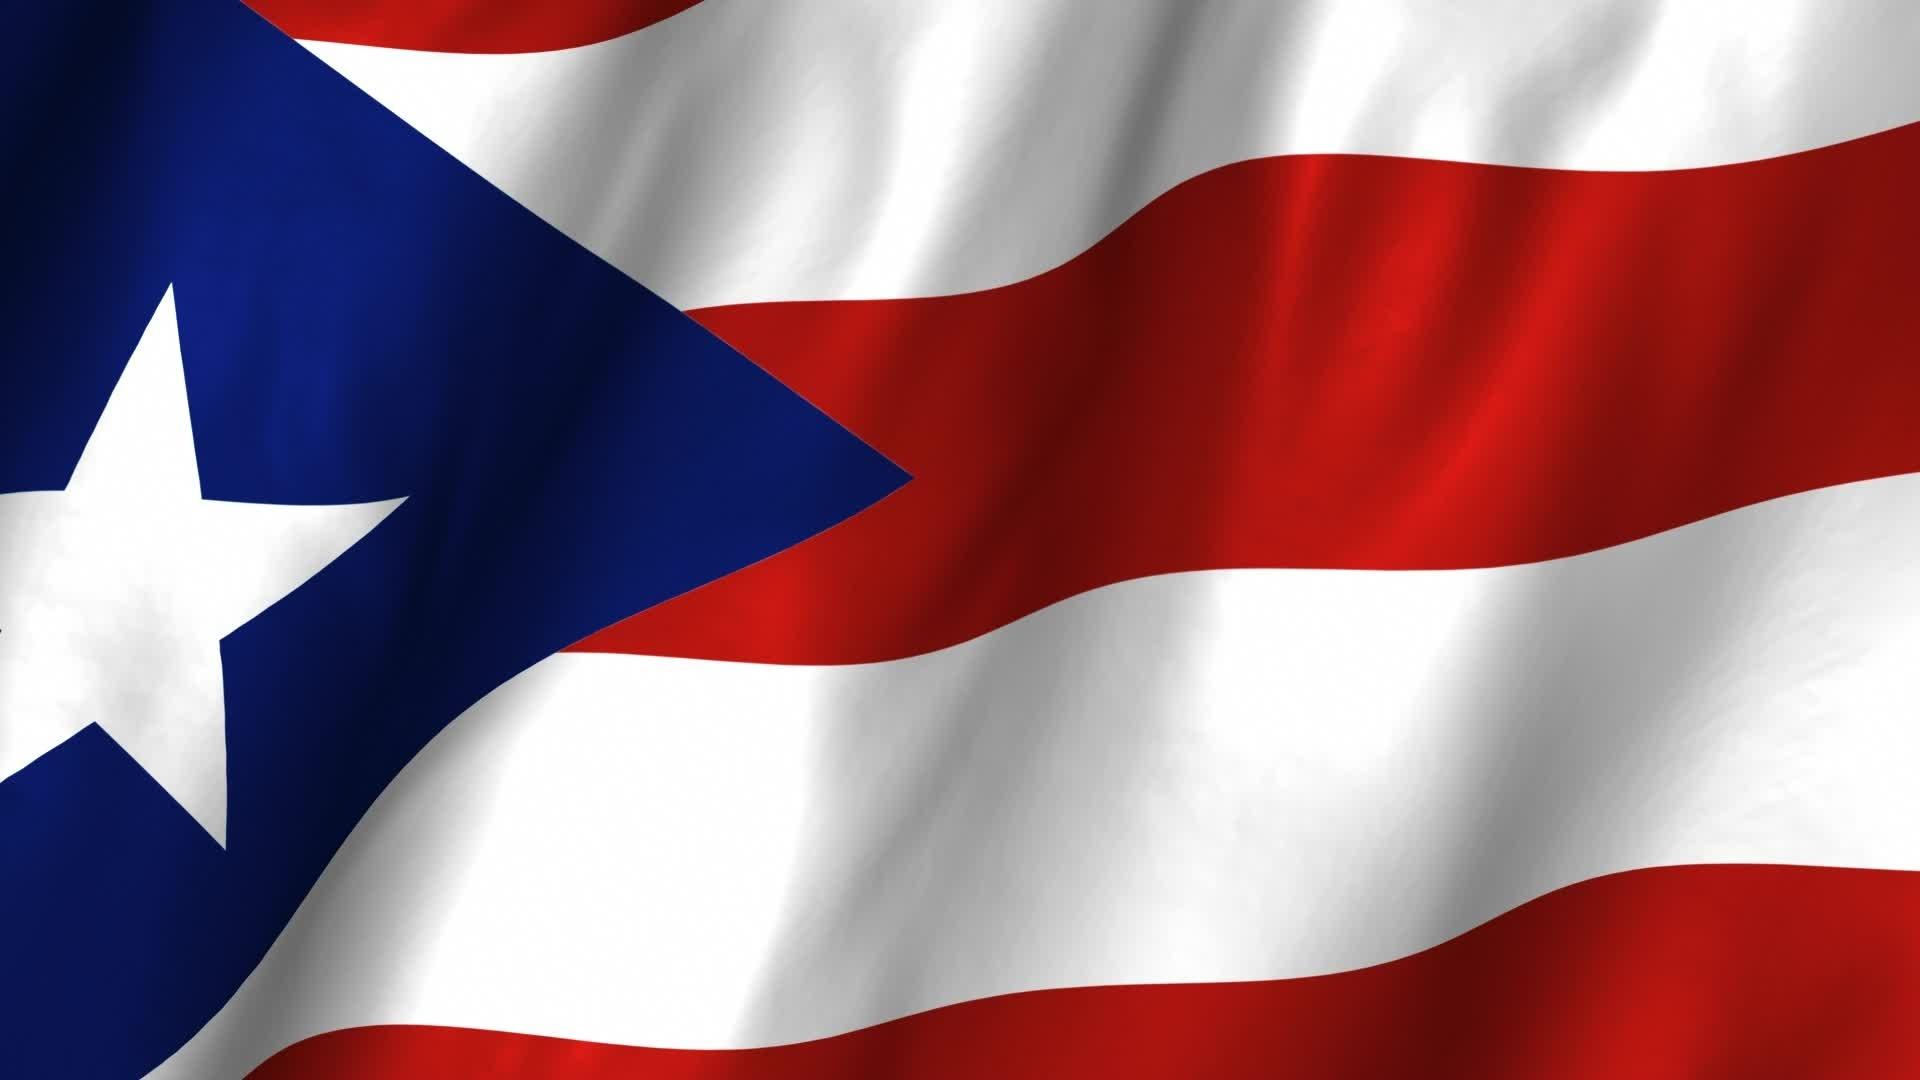 puerto rico flag desktop wallpaper 50702 1920x1080 px ~ hdwallsource